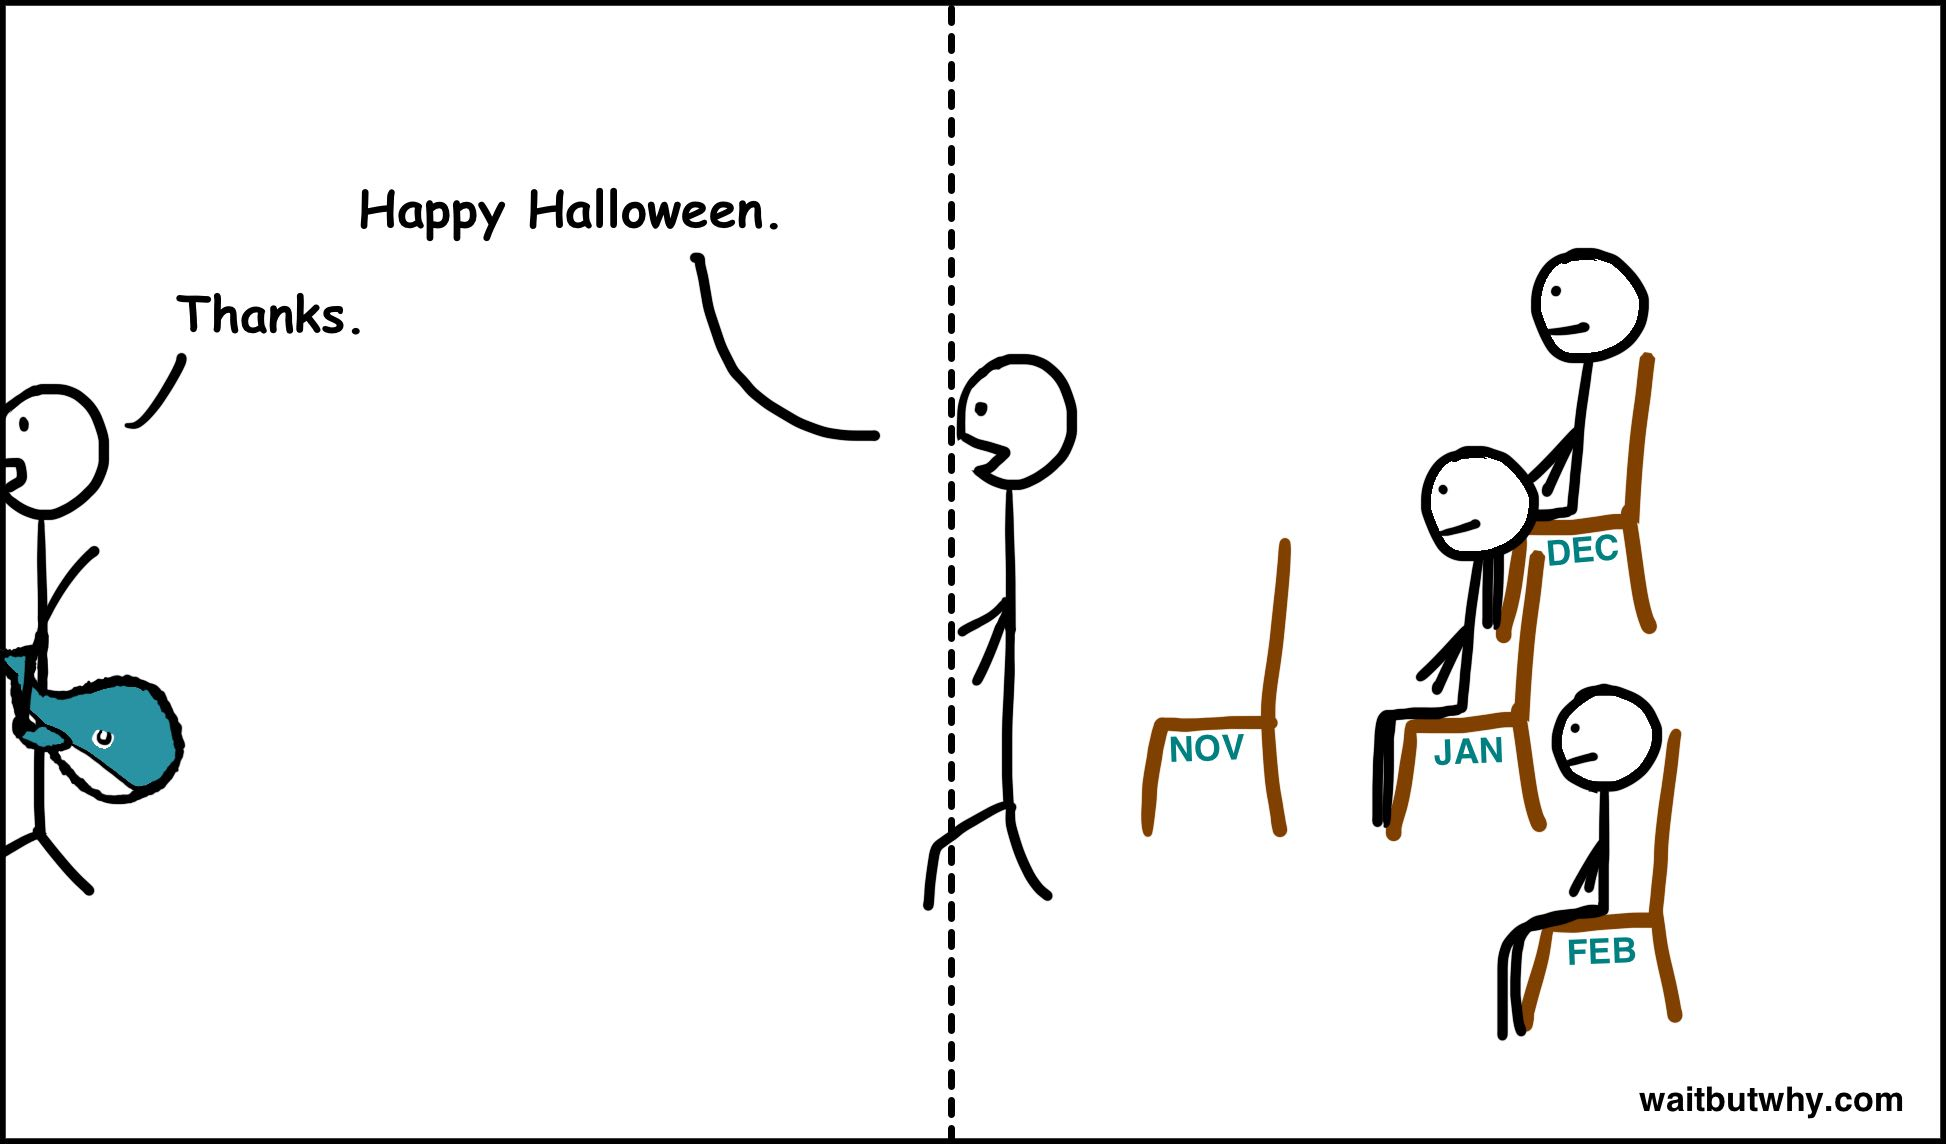 Nov: Happy Halloween. Oct: Thanks.